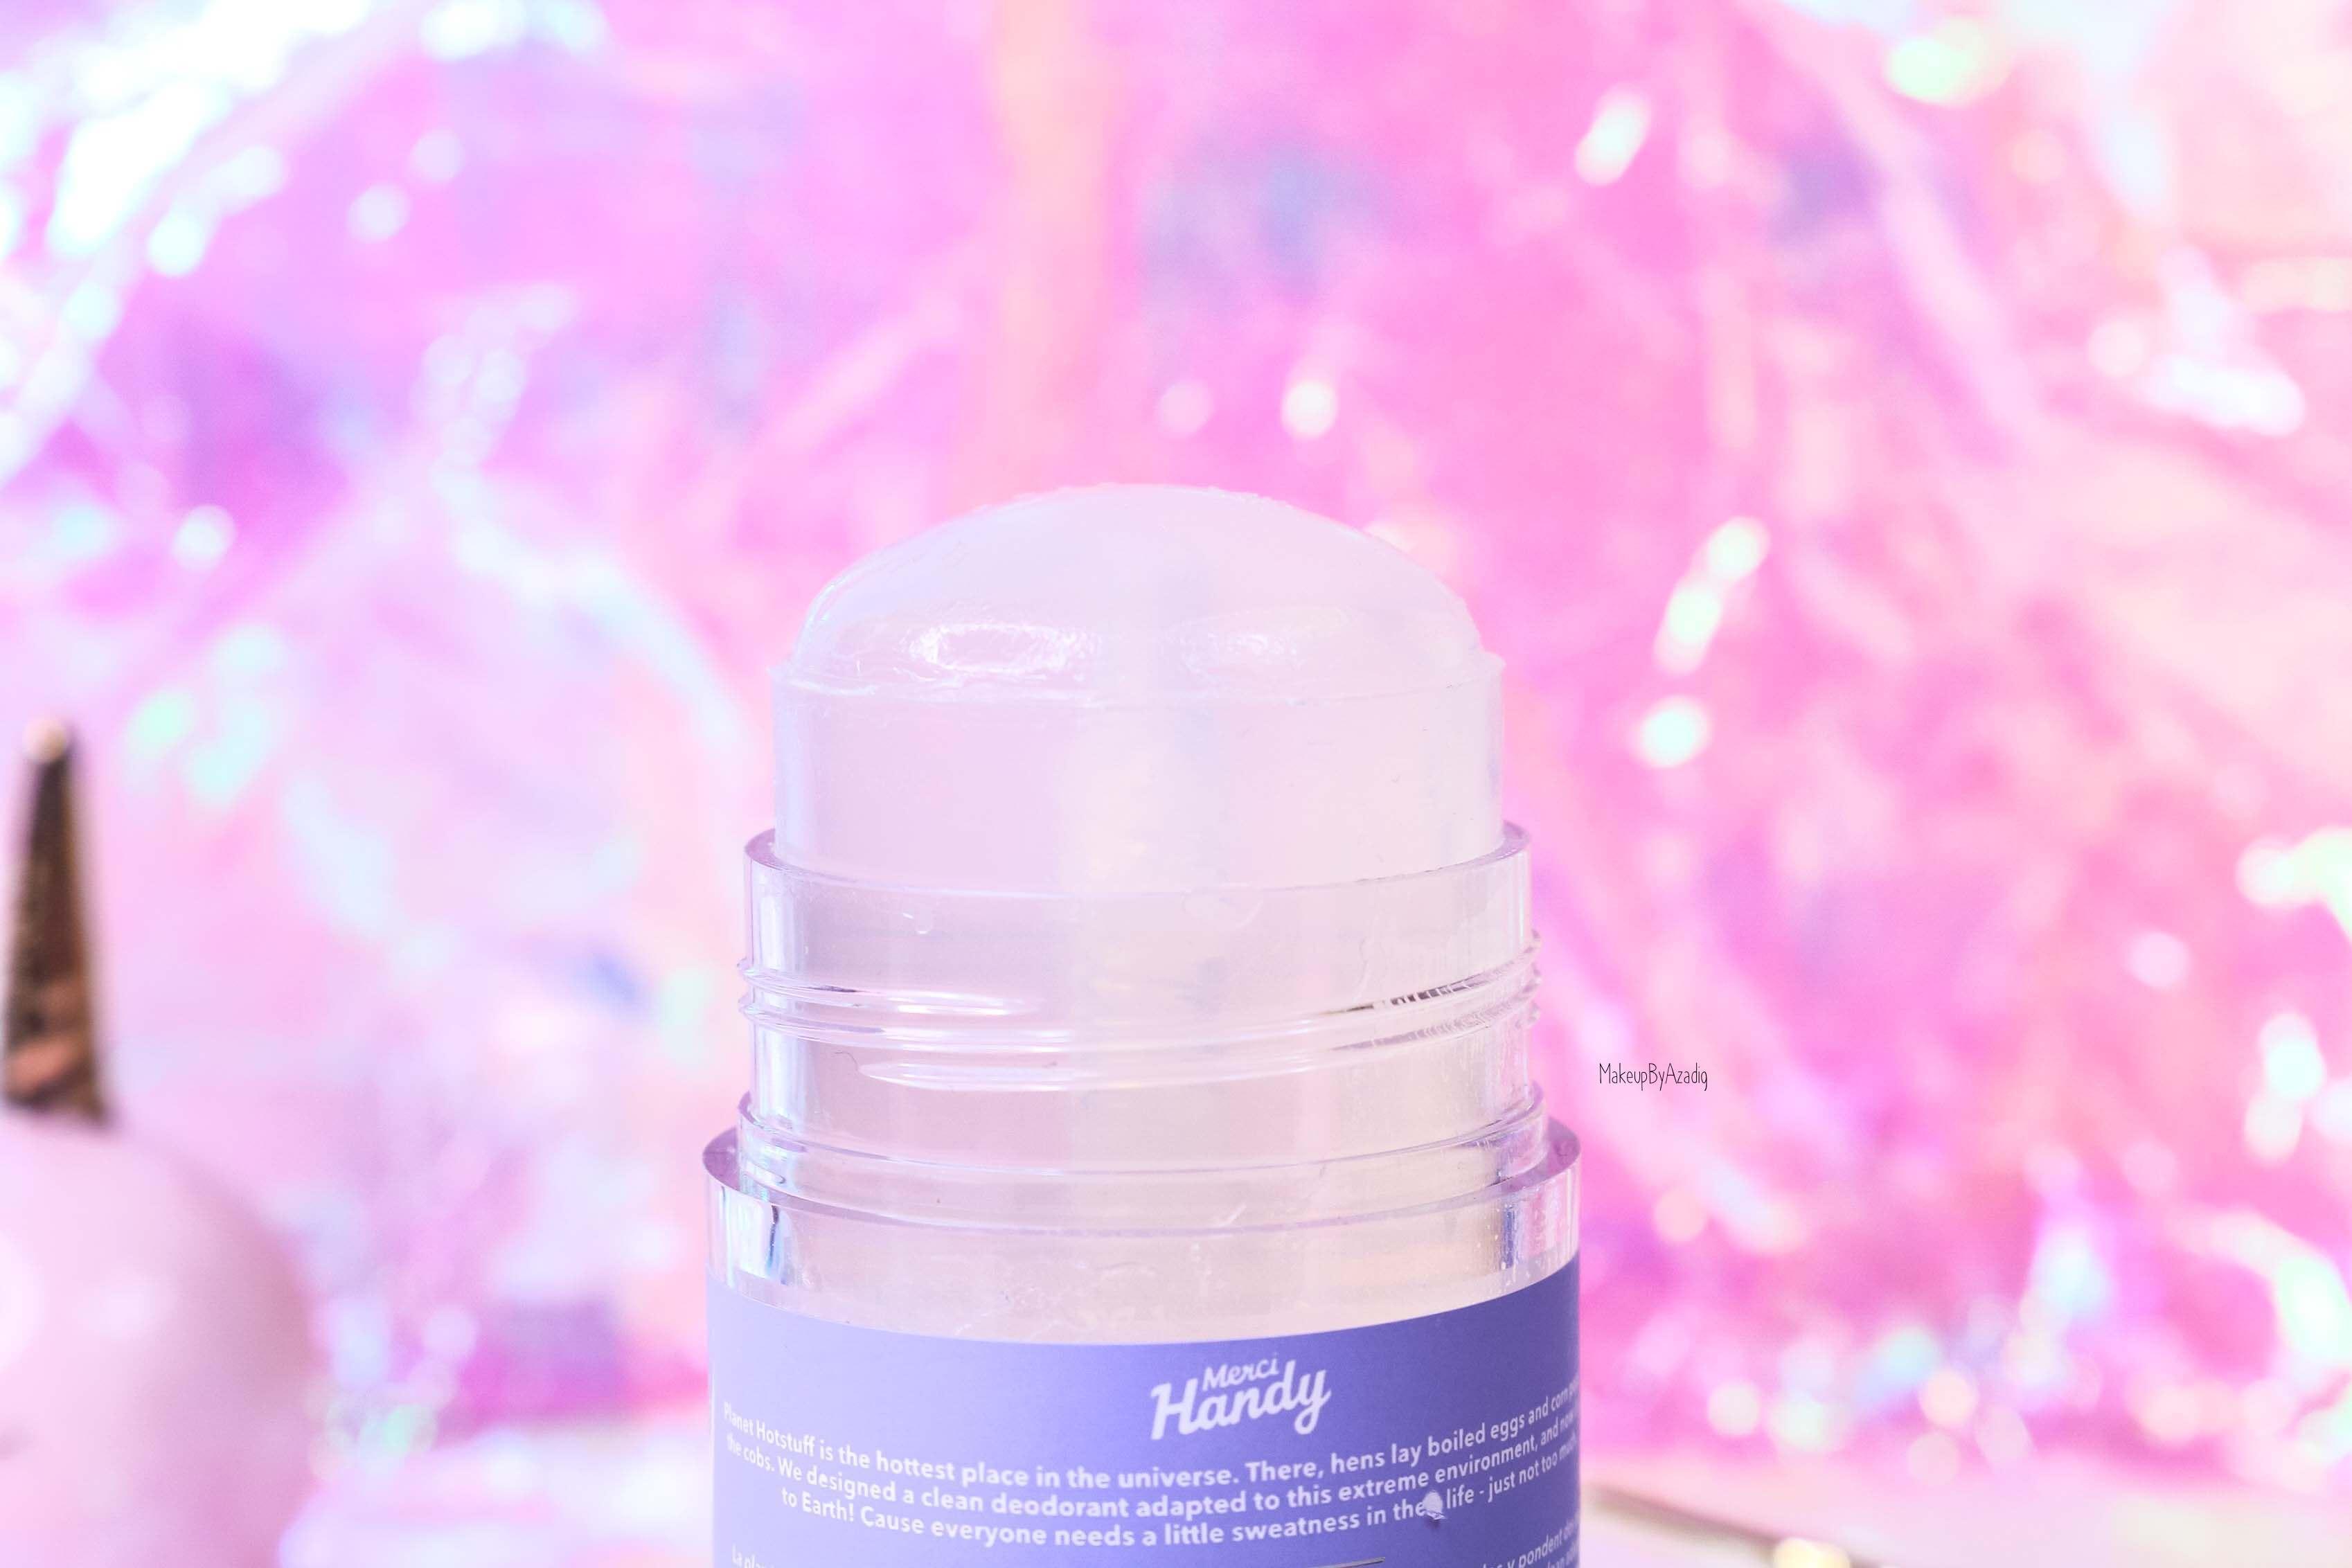 revue-clean-deodorant-merci-handy-namaste-flower-power-sans-aluminium-cruelty-free-avis-prix-makeupbyazadig-sephora-efficacite-soins